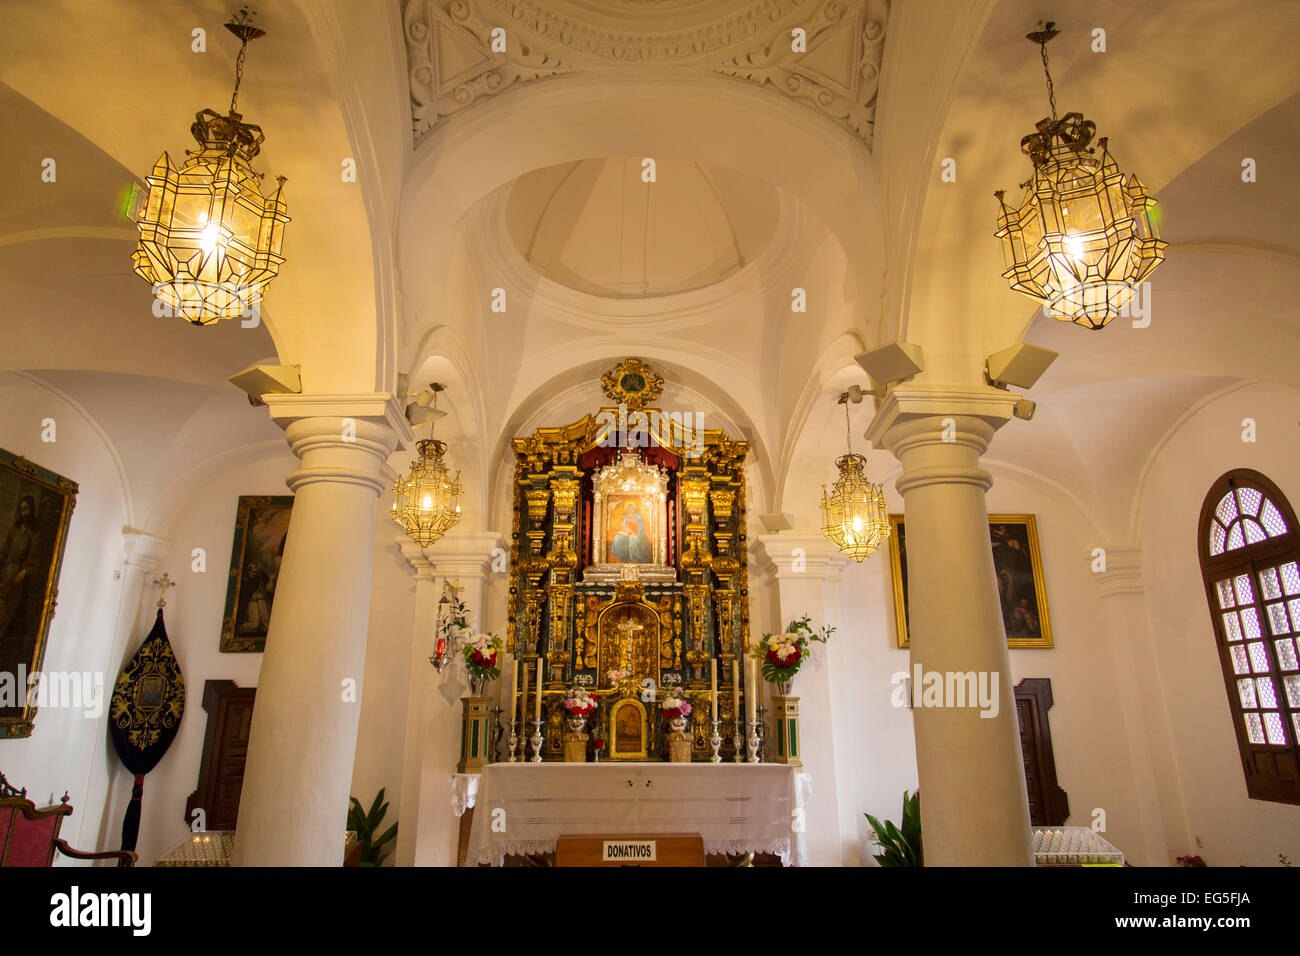 Hermitage Sanctuary Nuestra Señora Gracia Archidona Andalusia Spain Stock Pho...